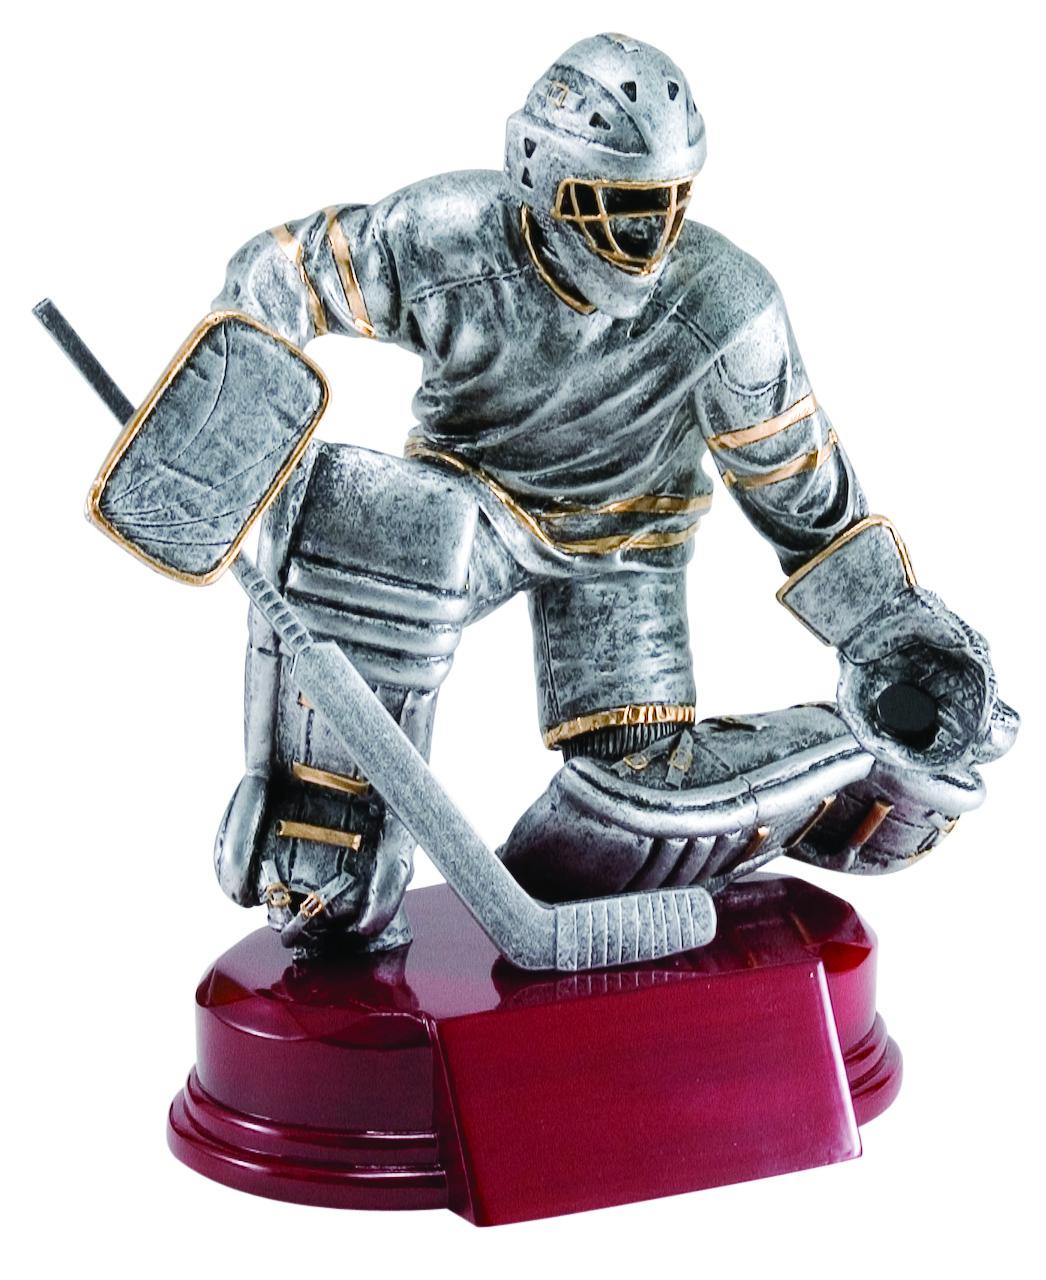 "Hockey, Goalie:   Large - Not Available  Medium - RFC-935 - 6.5""  Small - RFC-735 - 5.25"""